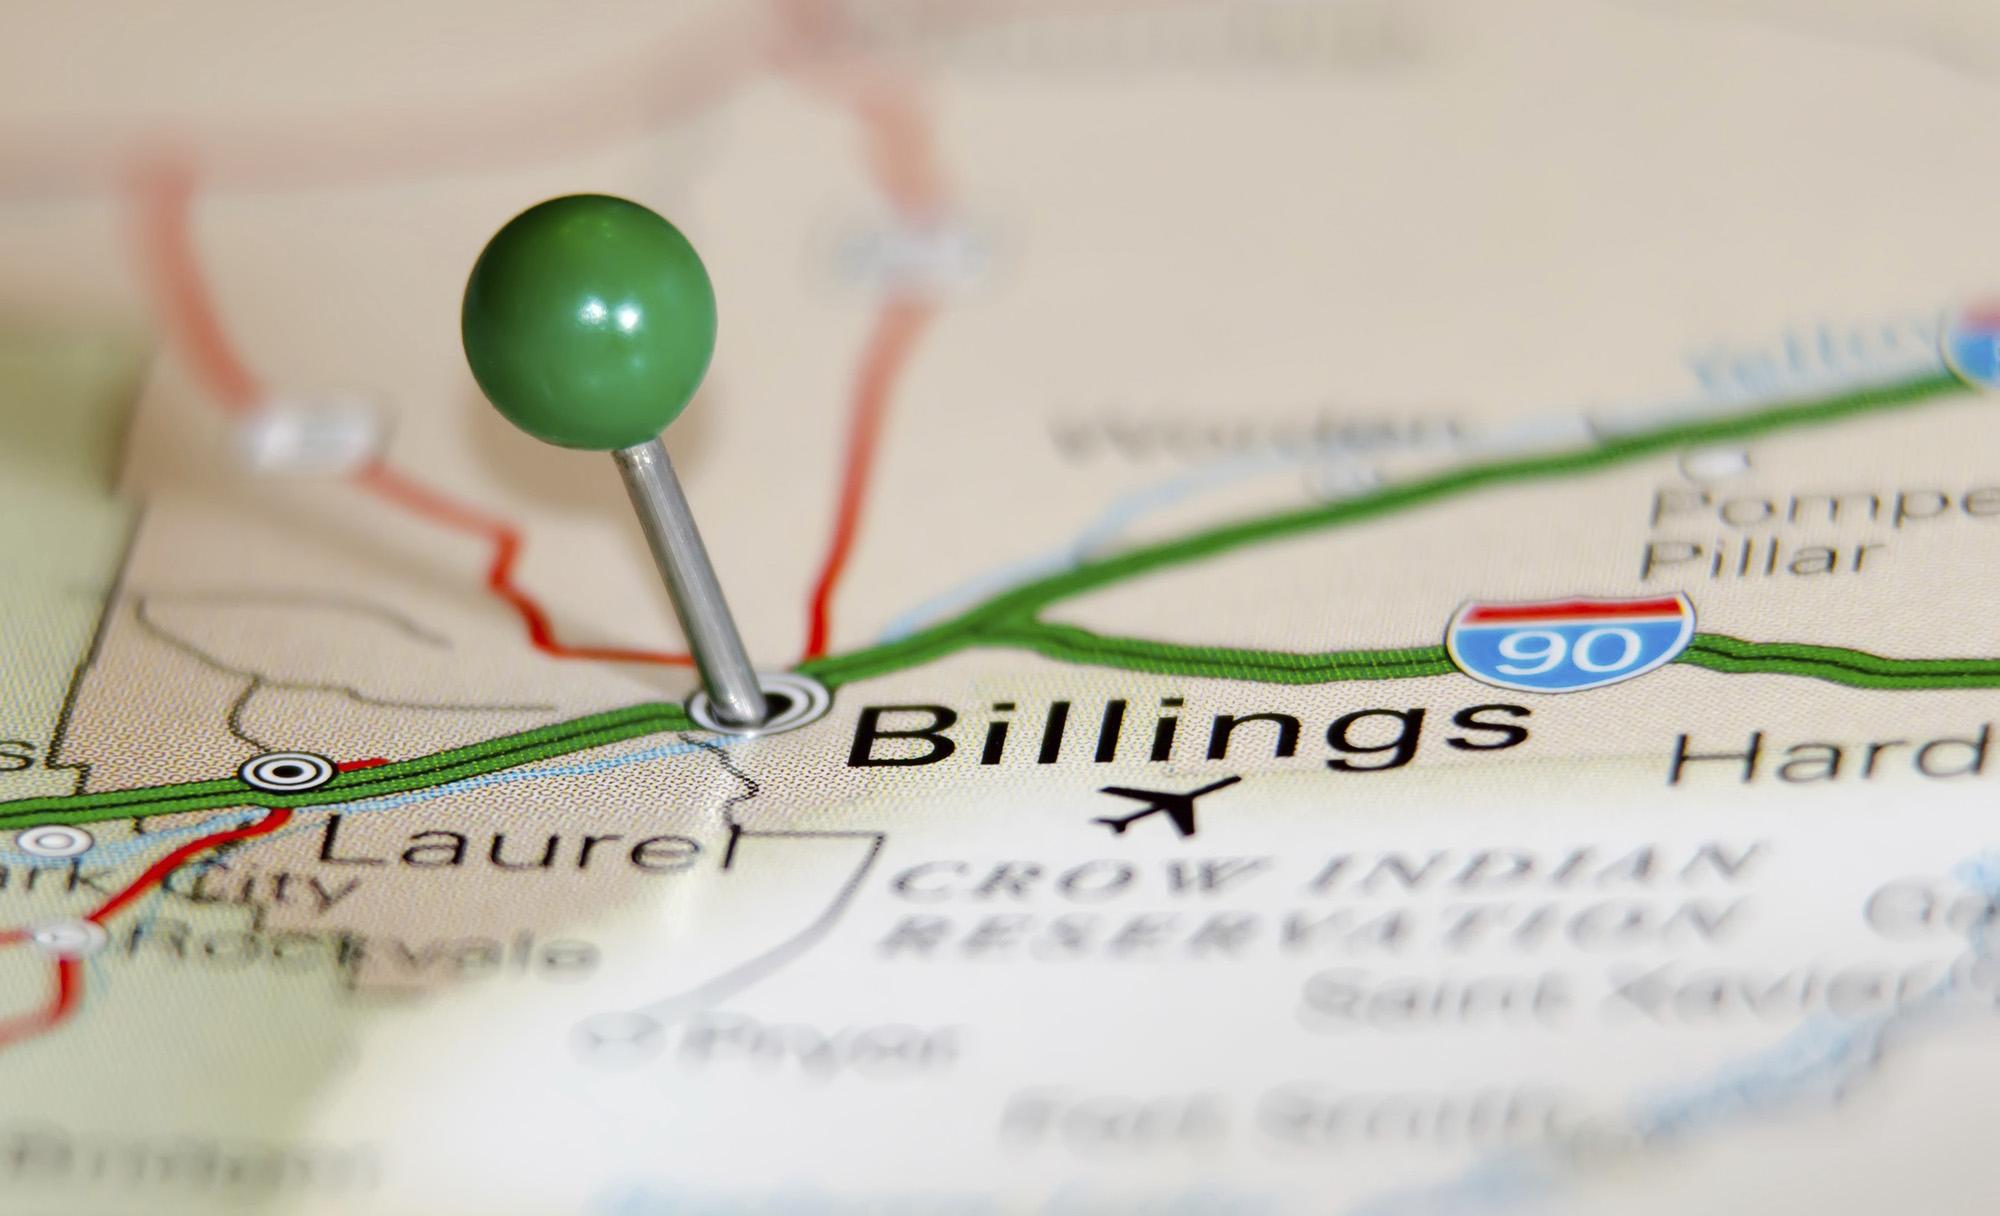 City of BIllings Montana